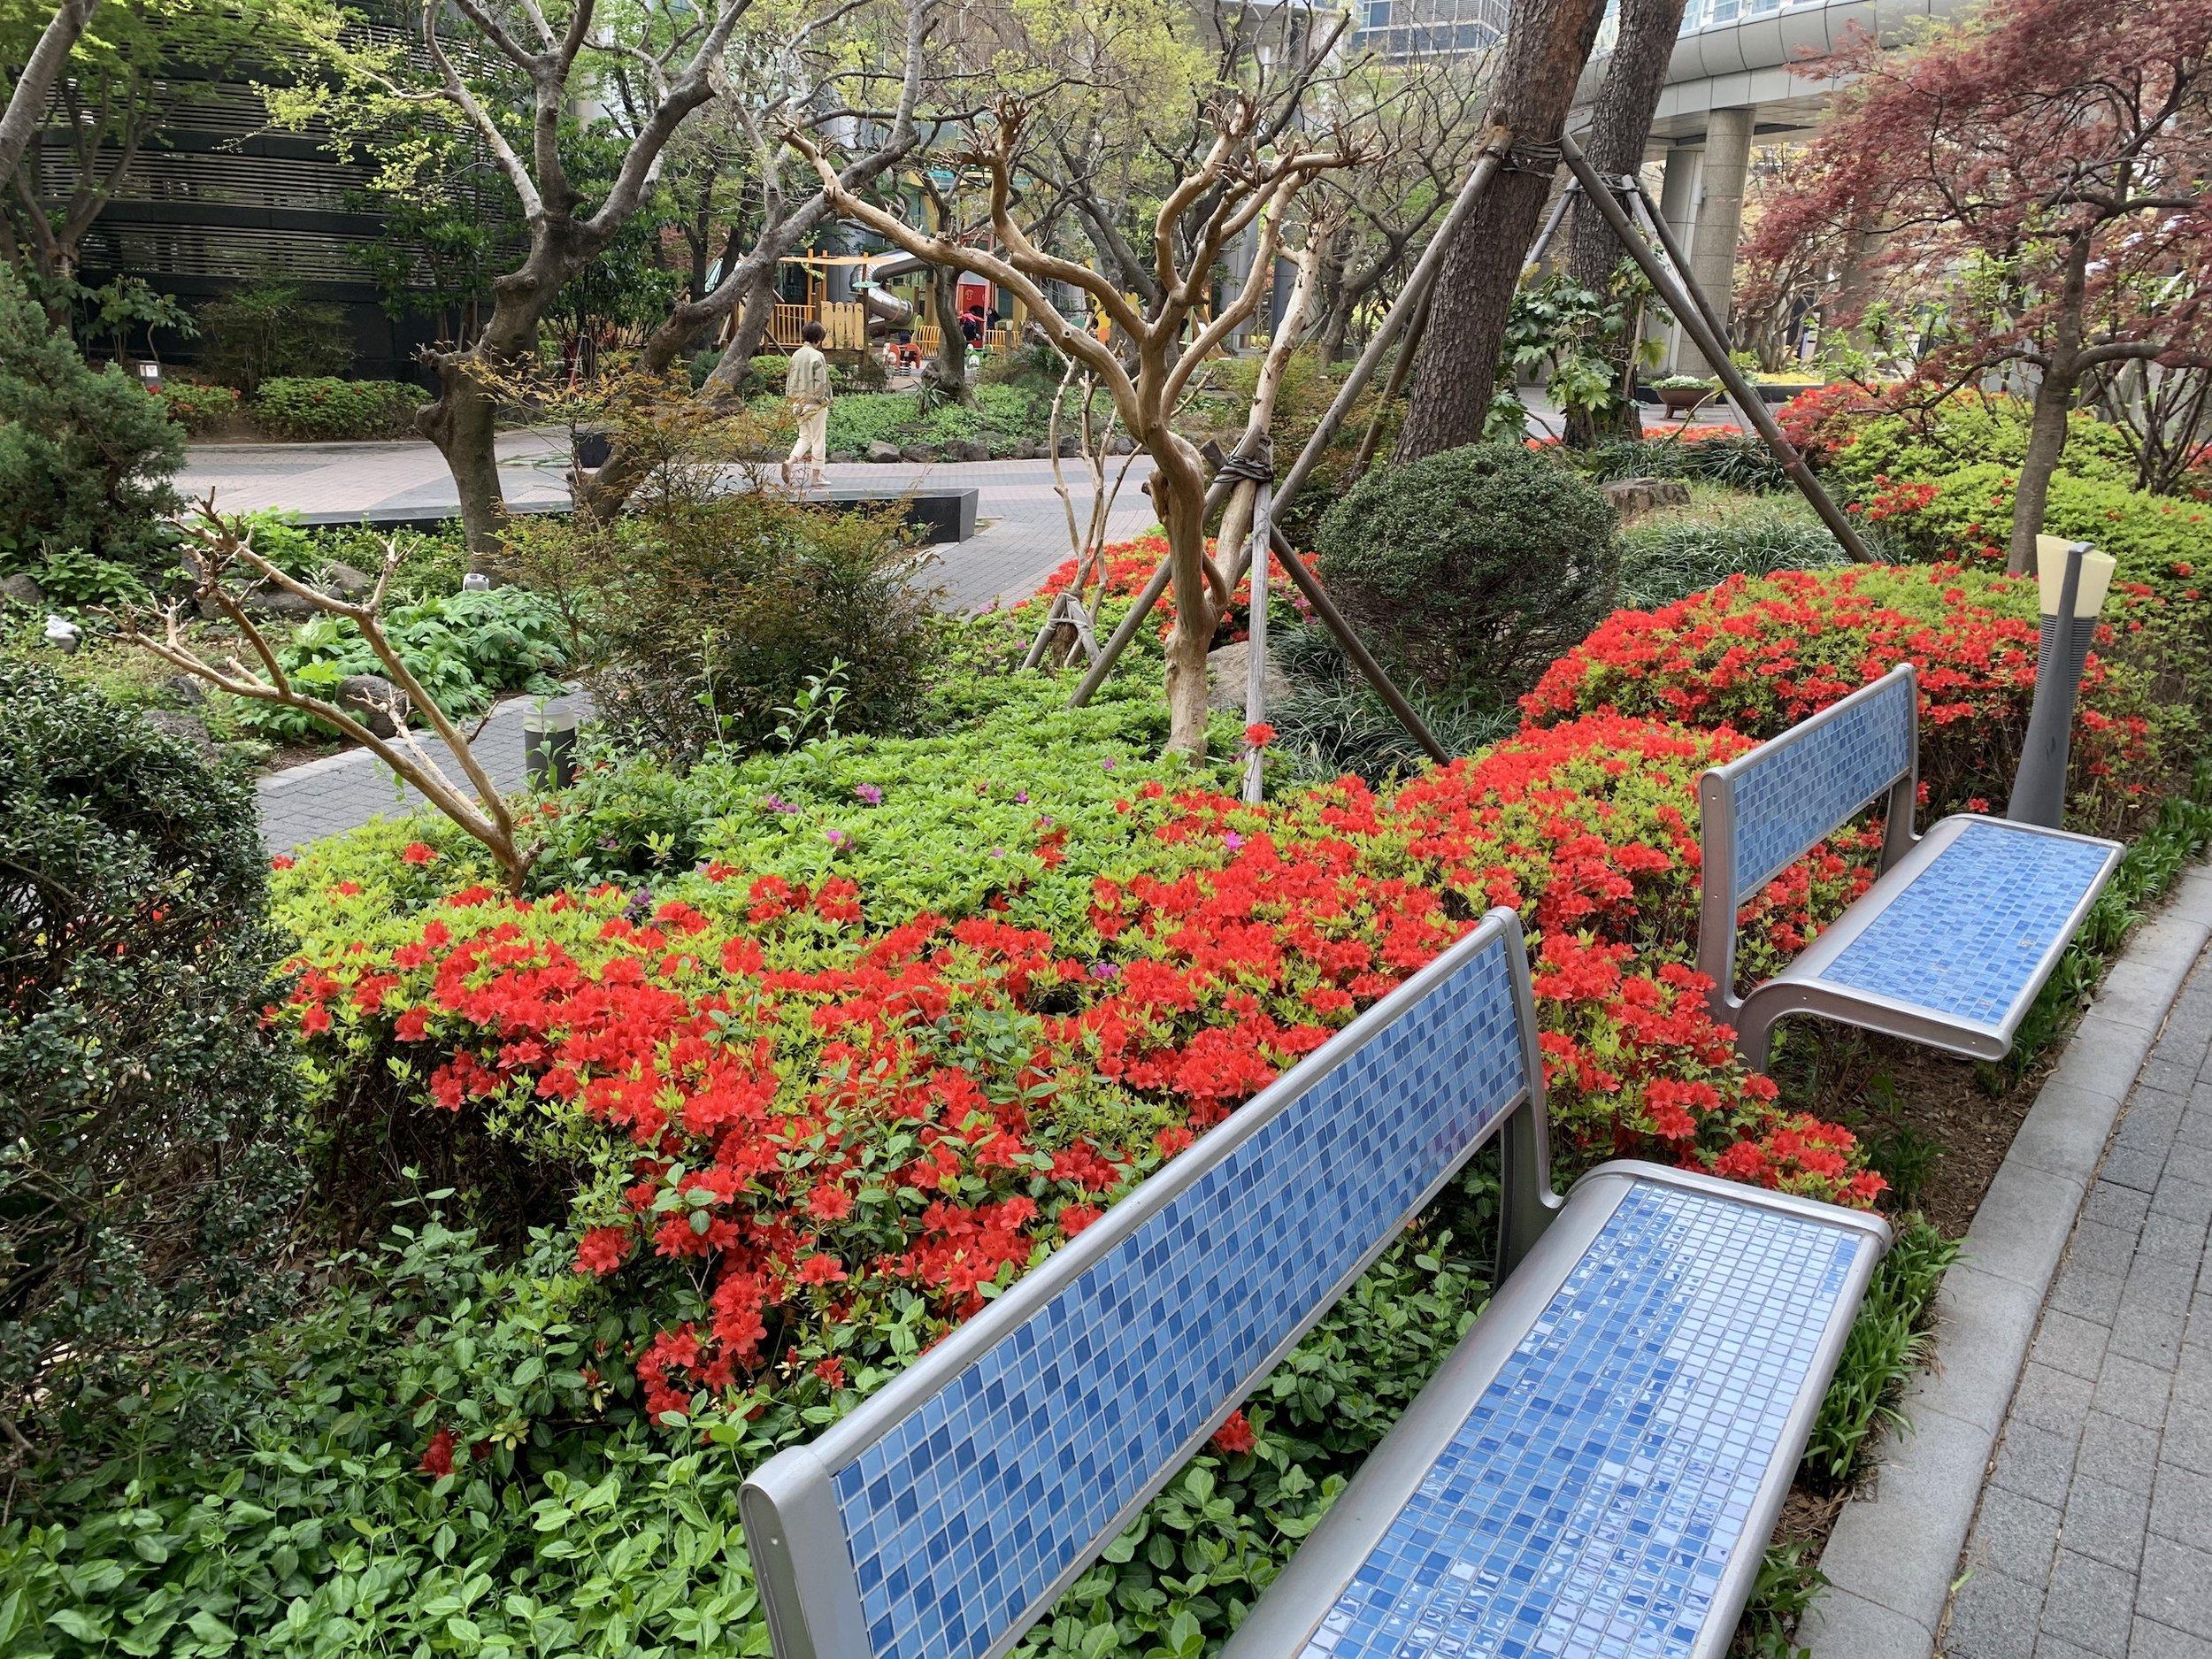 Spring in Busan부산의 봄꽃색깔 완전 예쁘다.